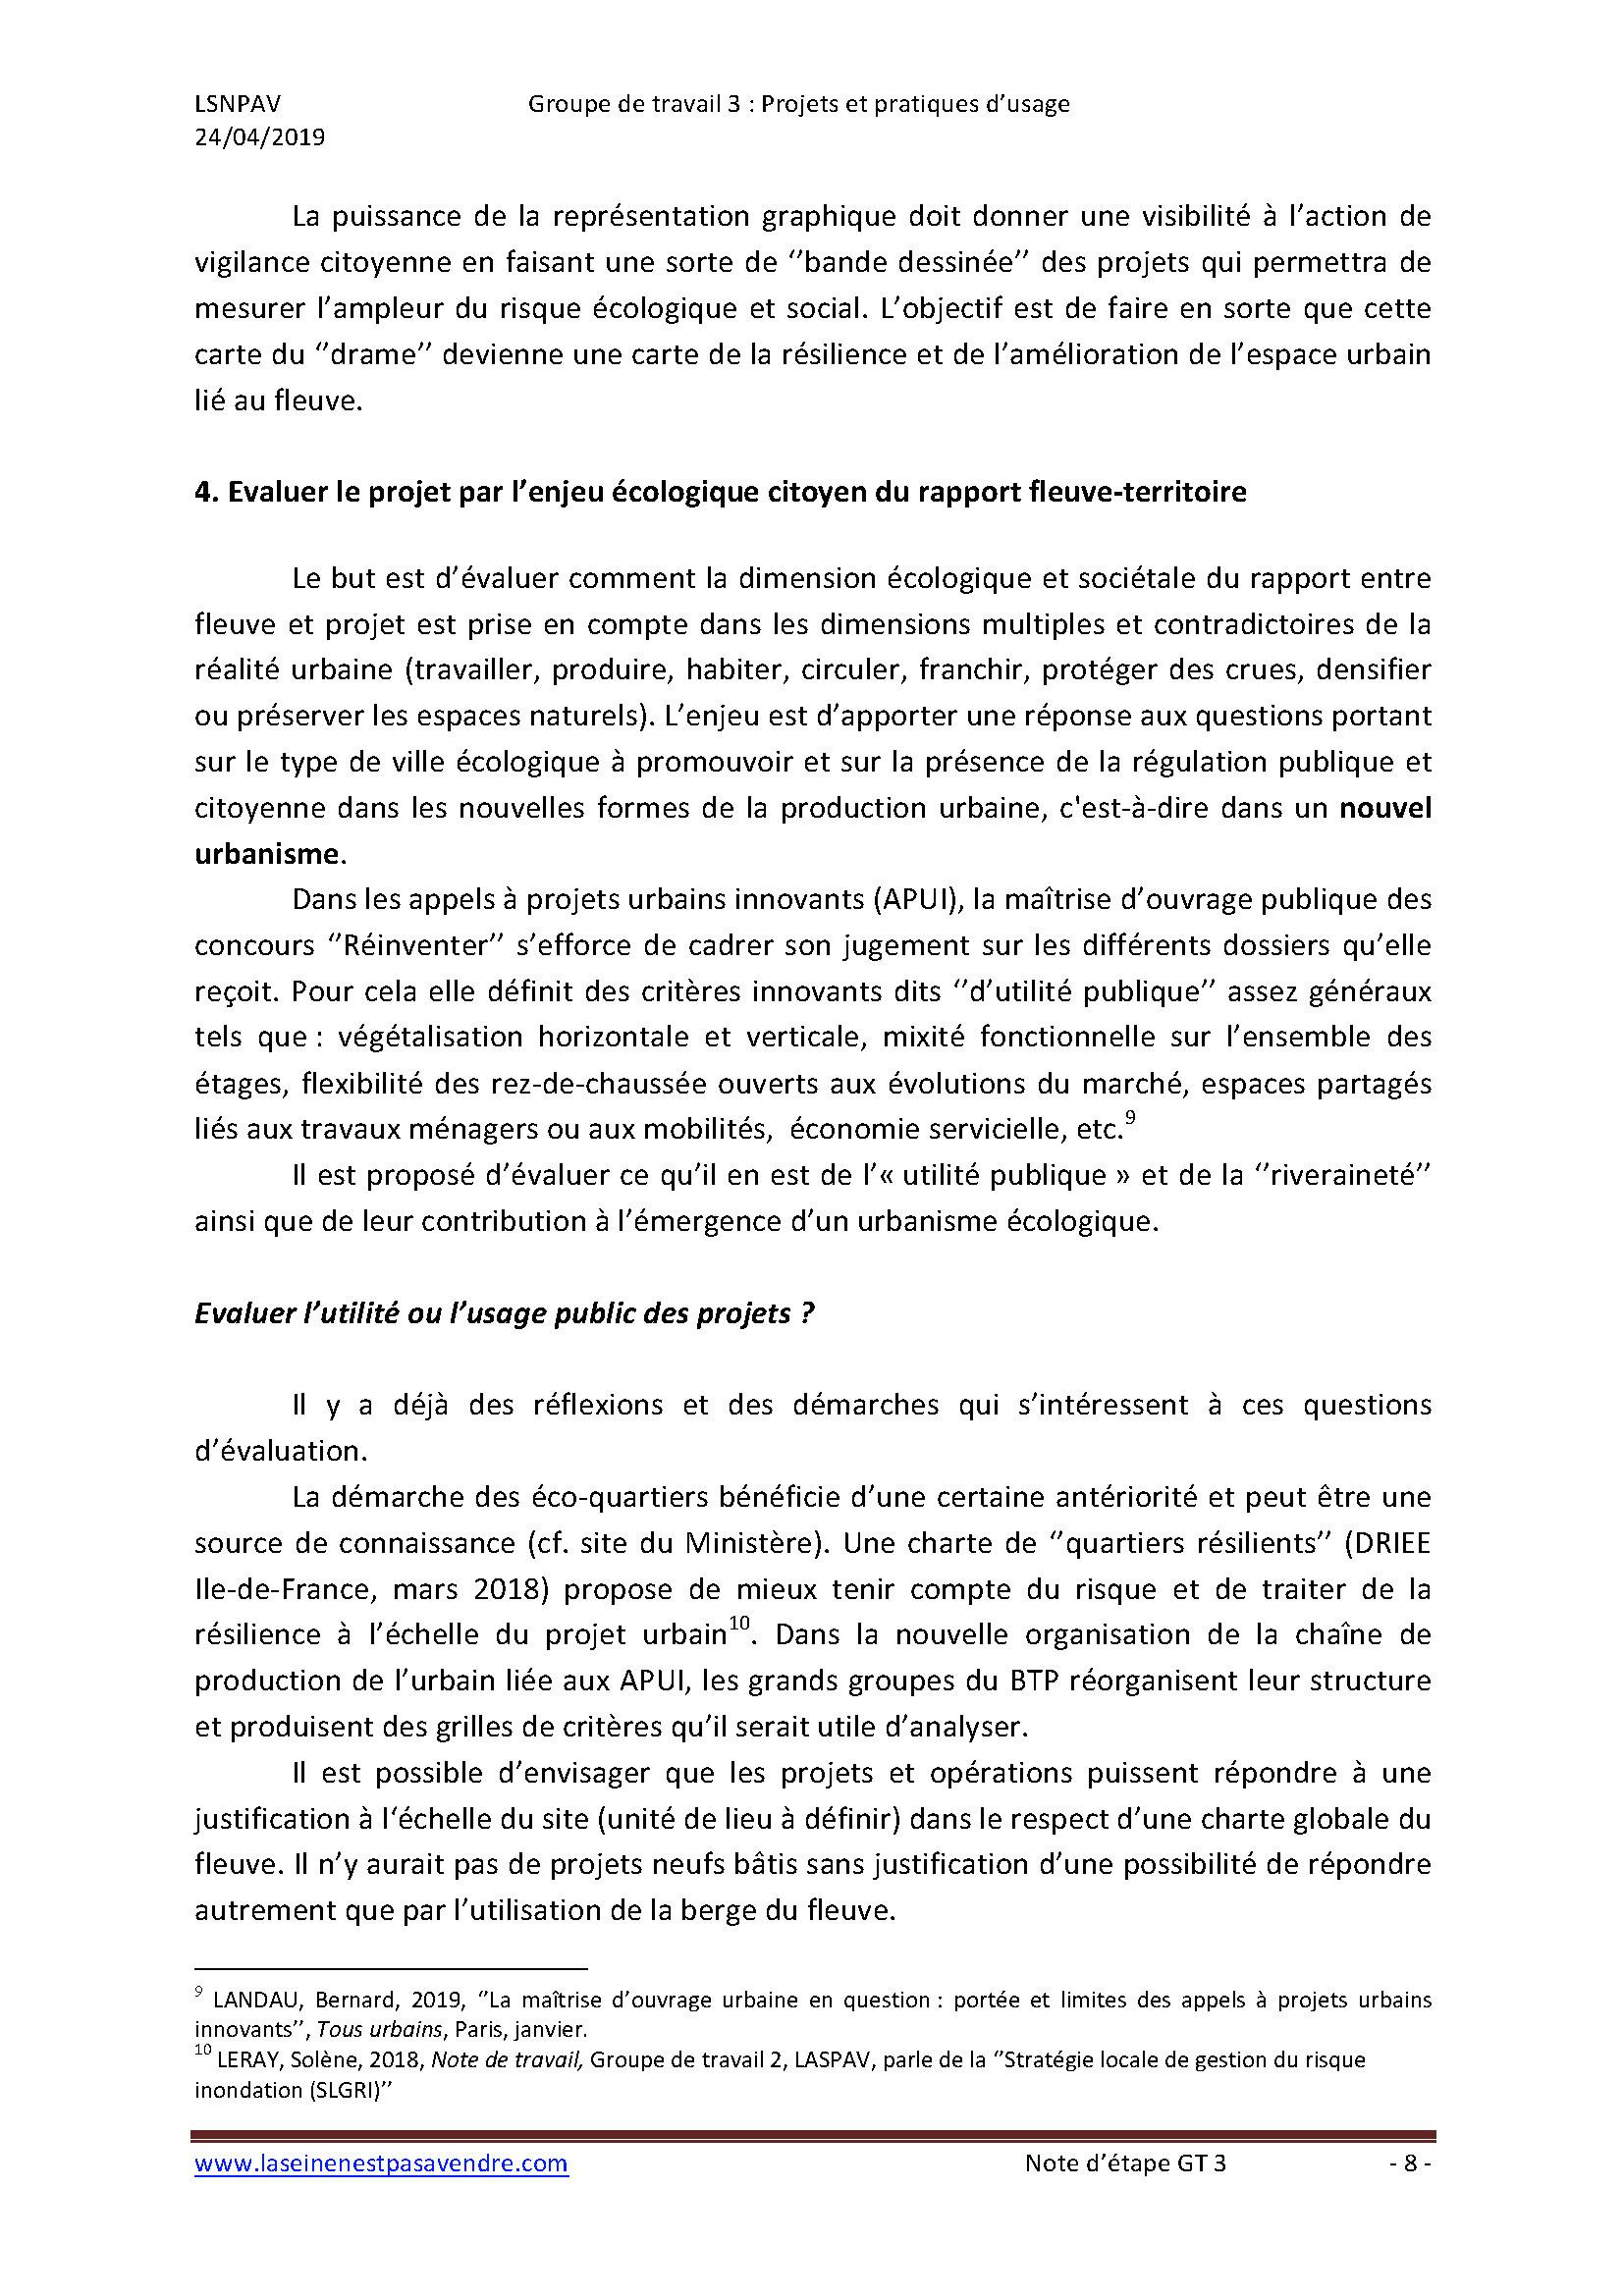 GT 3 Note d'étape_Page_08.jpg